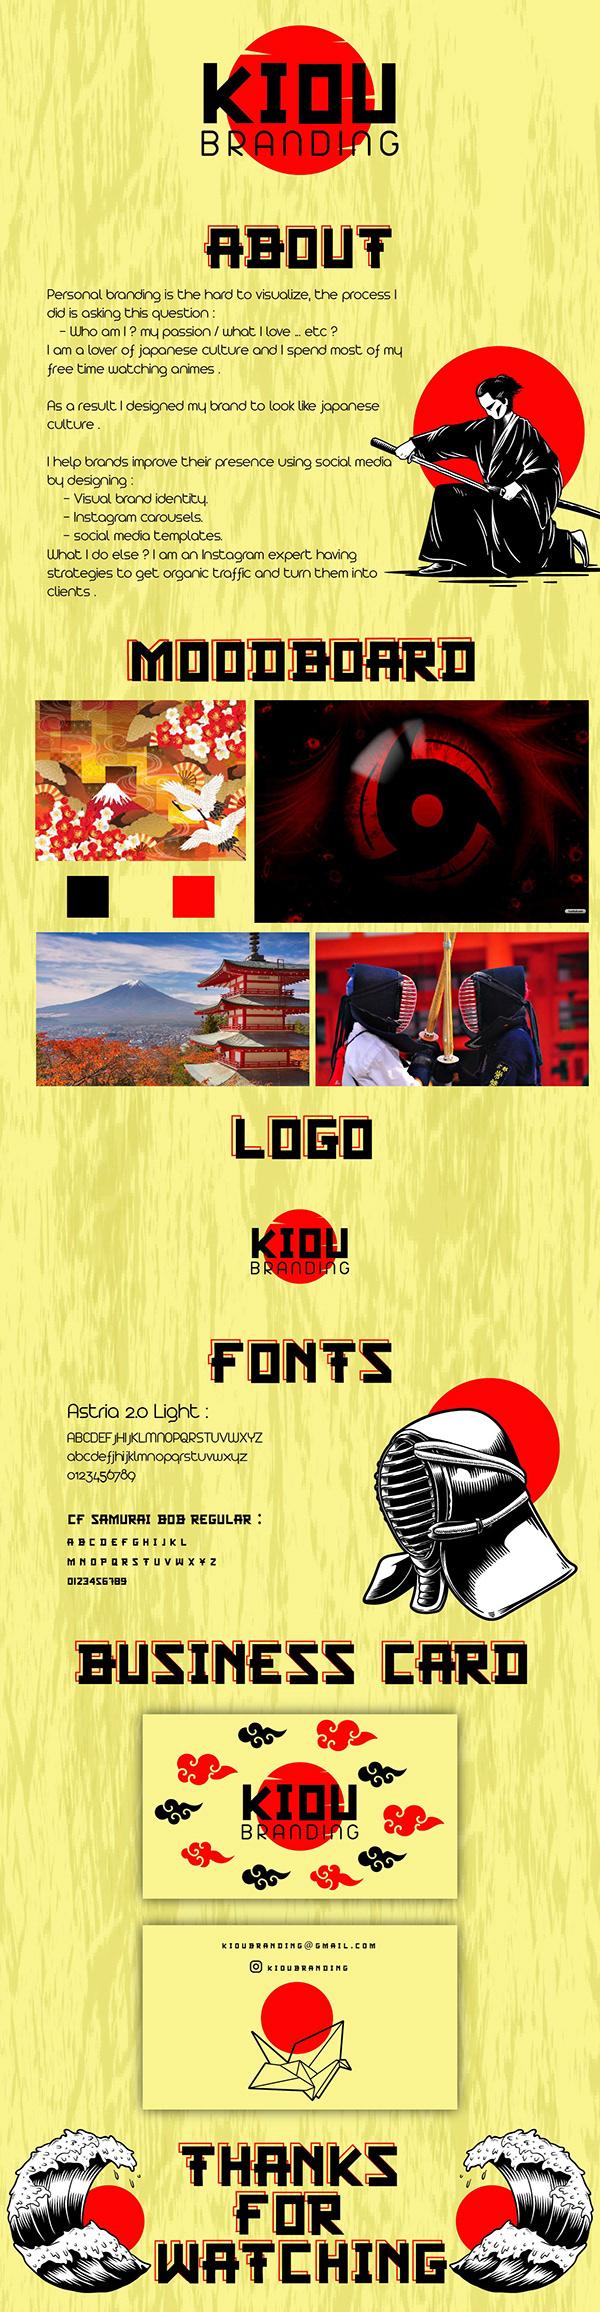 Personal brand identity - KIOU BRANDING